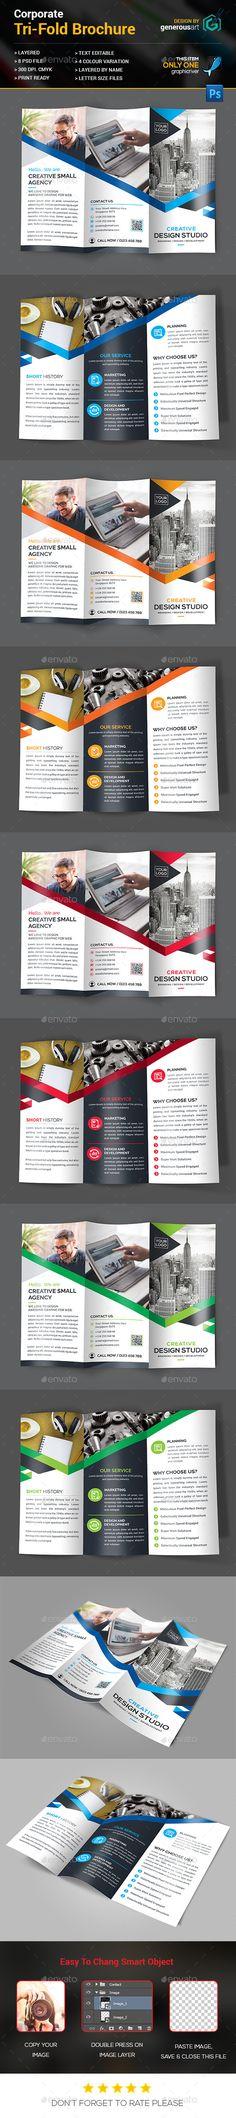 Tri-Fold Brochure Template PSD. Download here: http://graphicriver.net/item/trifold-brochure/14836566?ref=ksioks